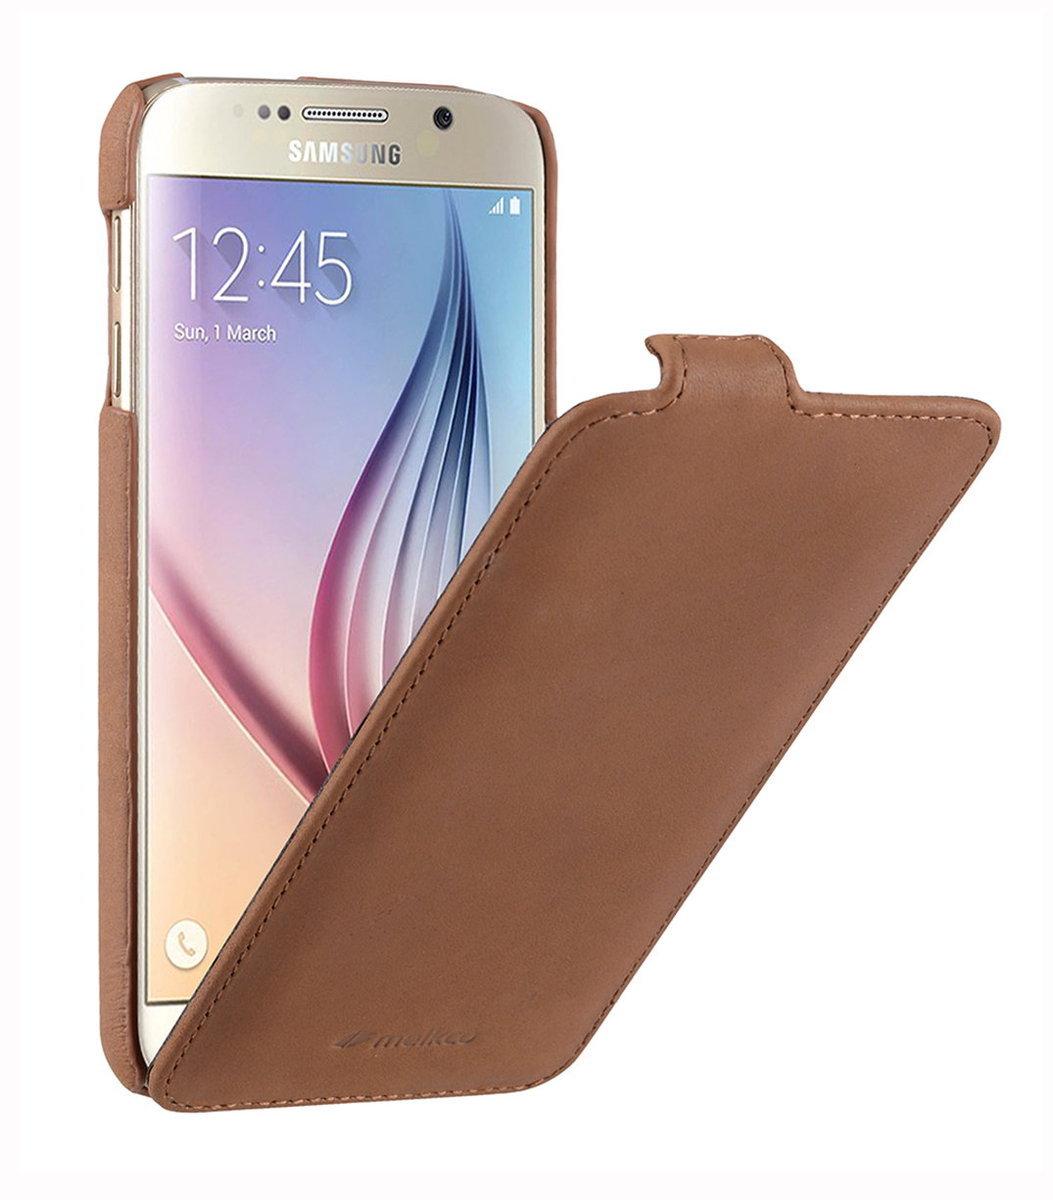 Samsung Galaxy S6 Jacka Type 高級真皮革手機套 (經典復古褐色)